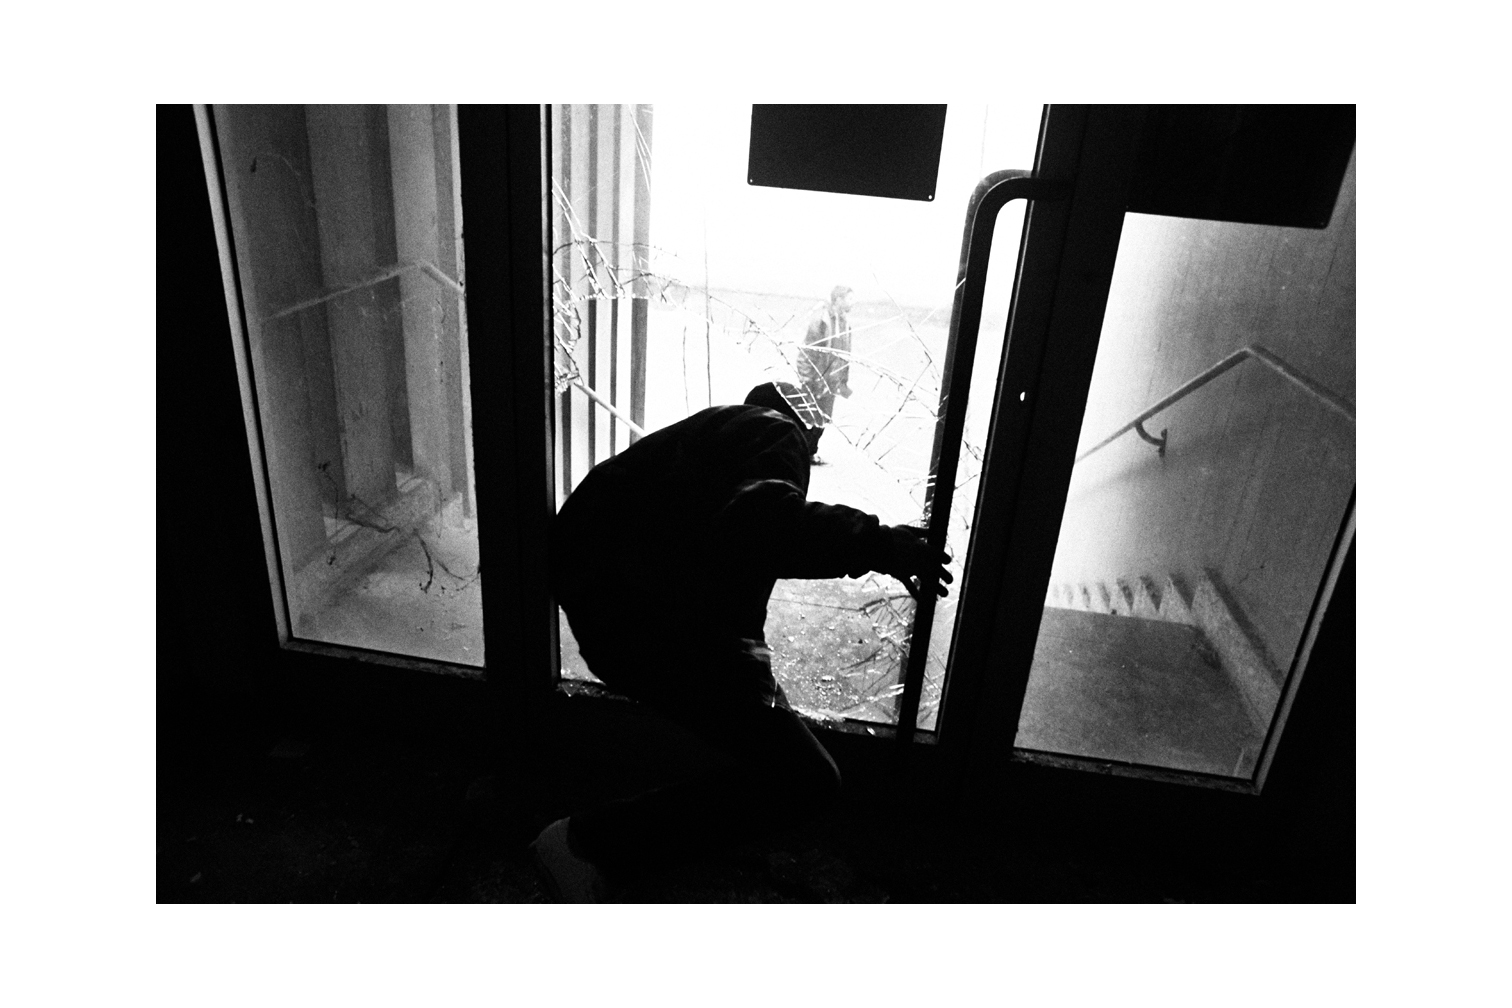 SkylineSeekers Marco Aurelio Media Eppol Milano   Collater.al 9